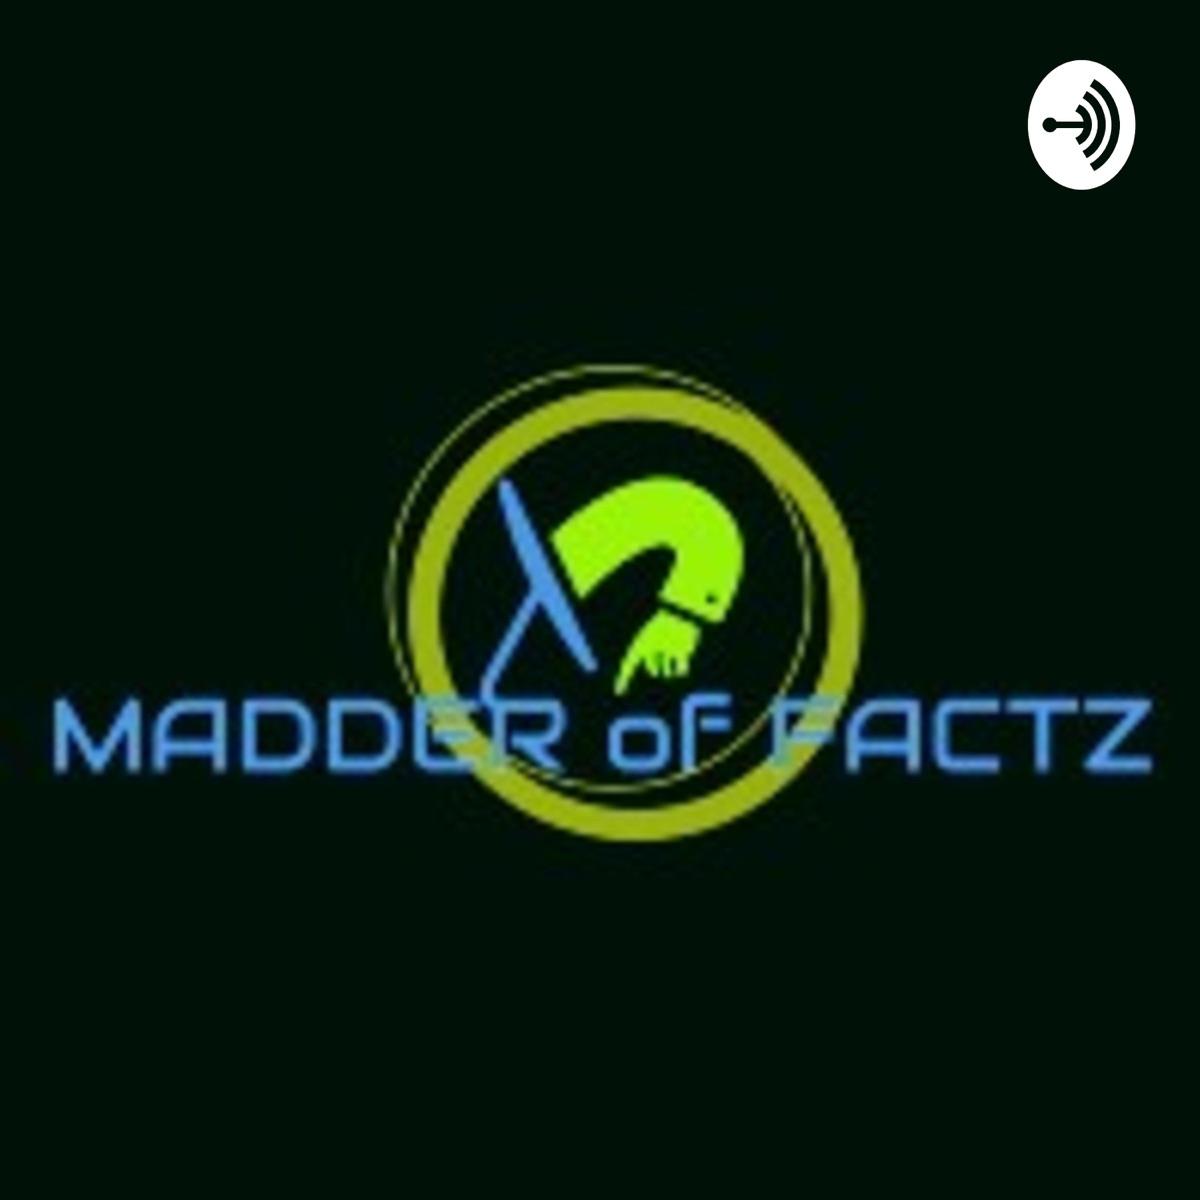 MADDER of FACTZ